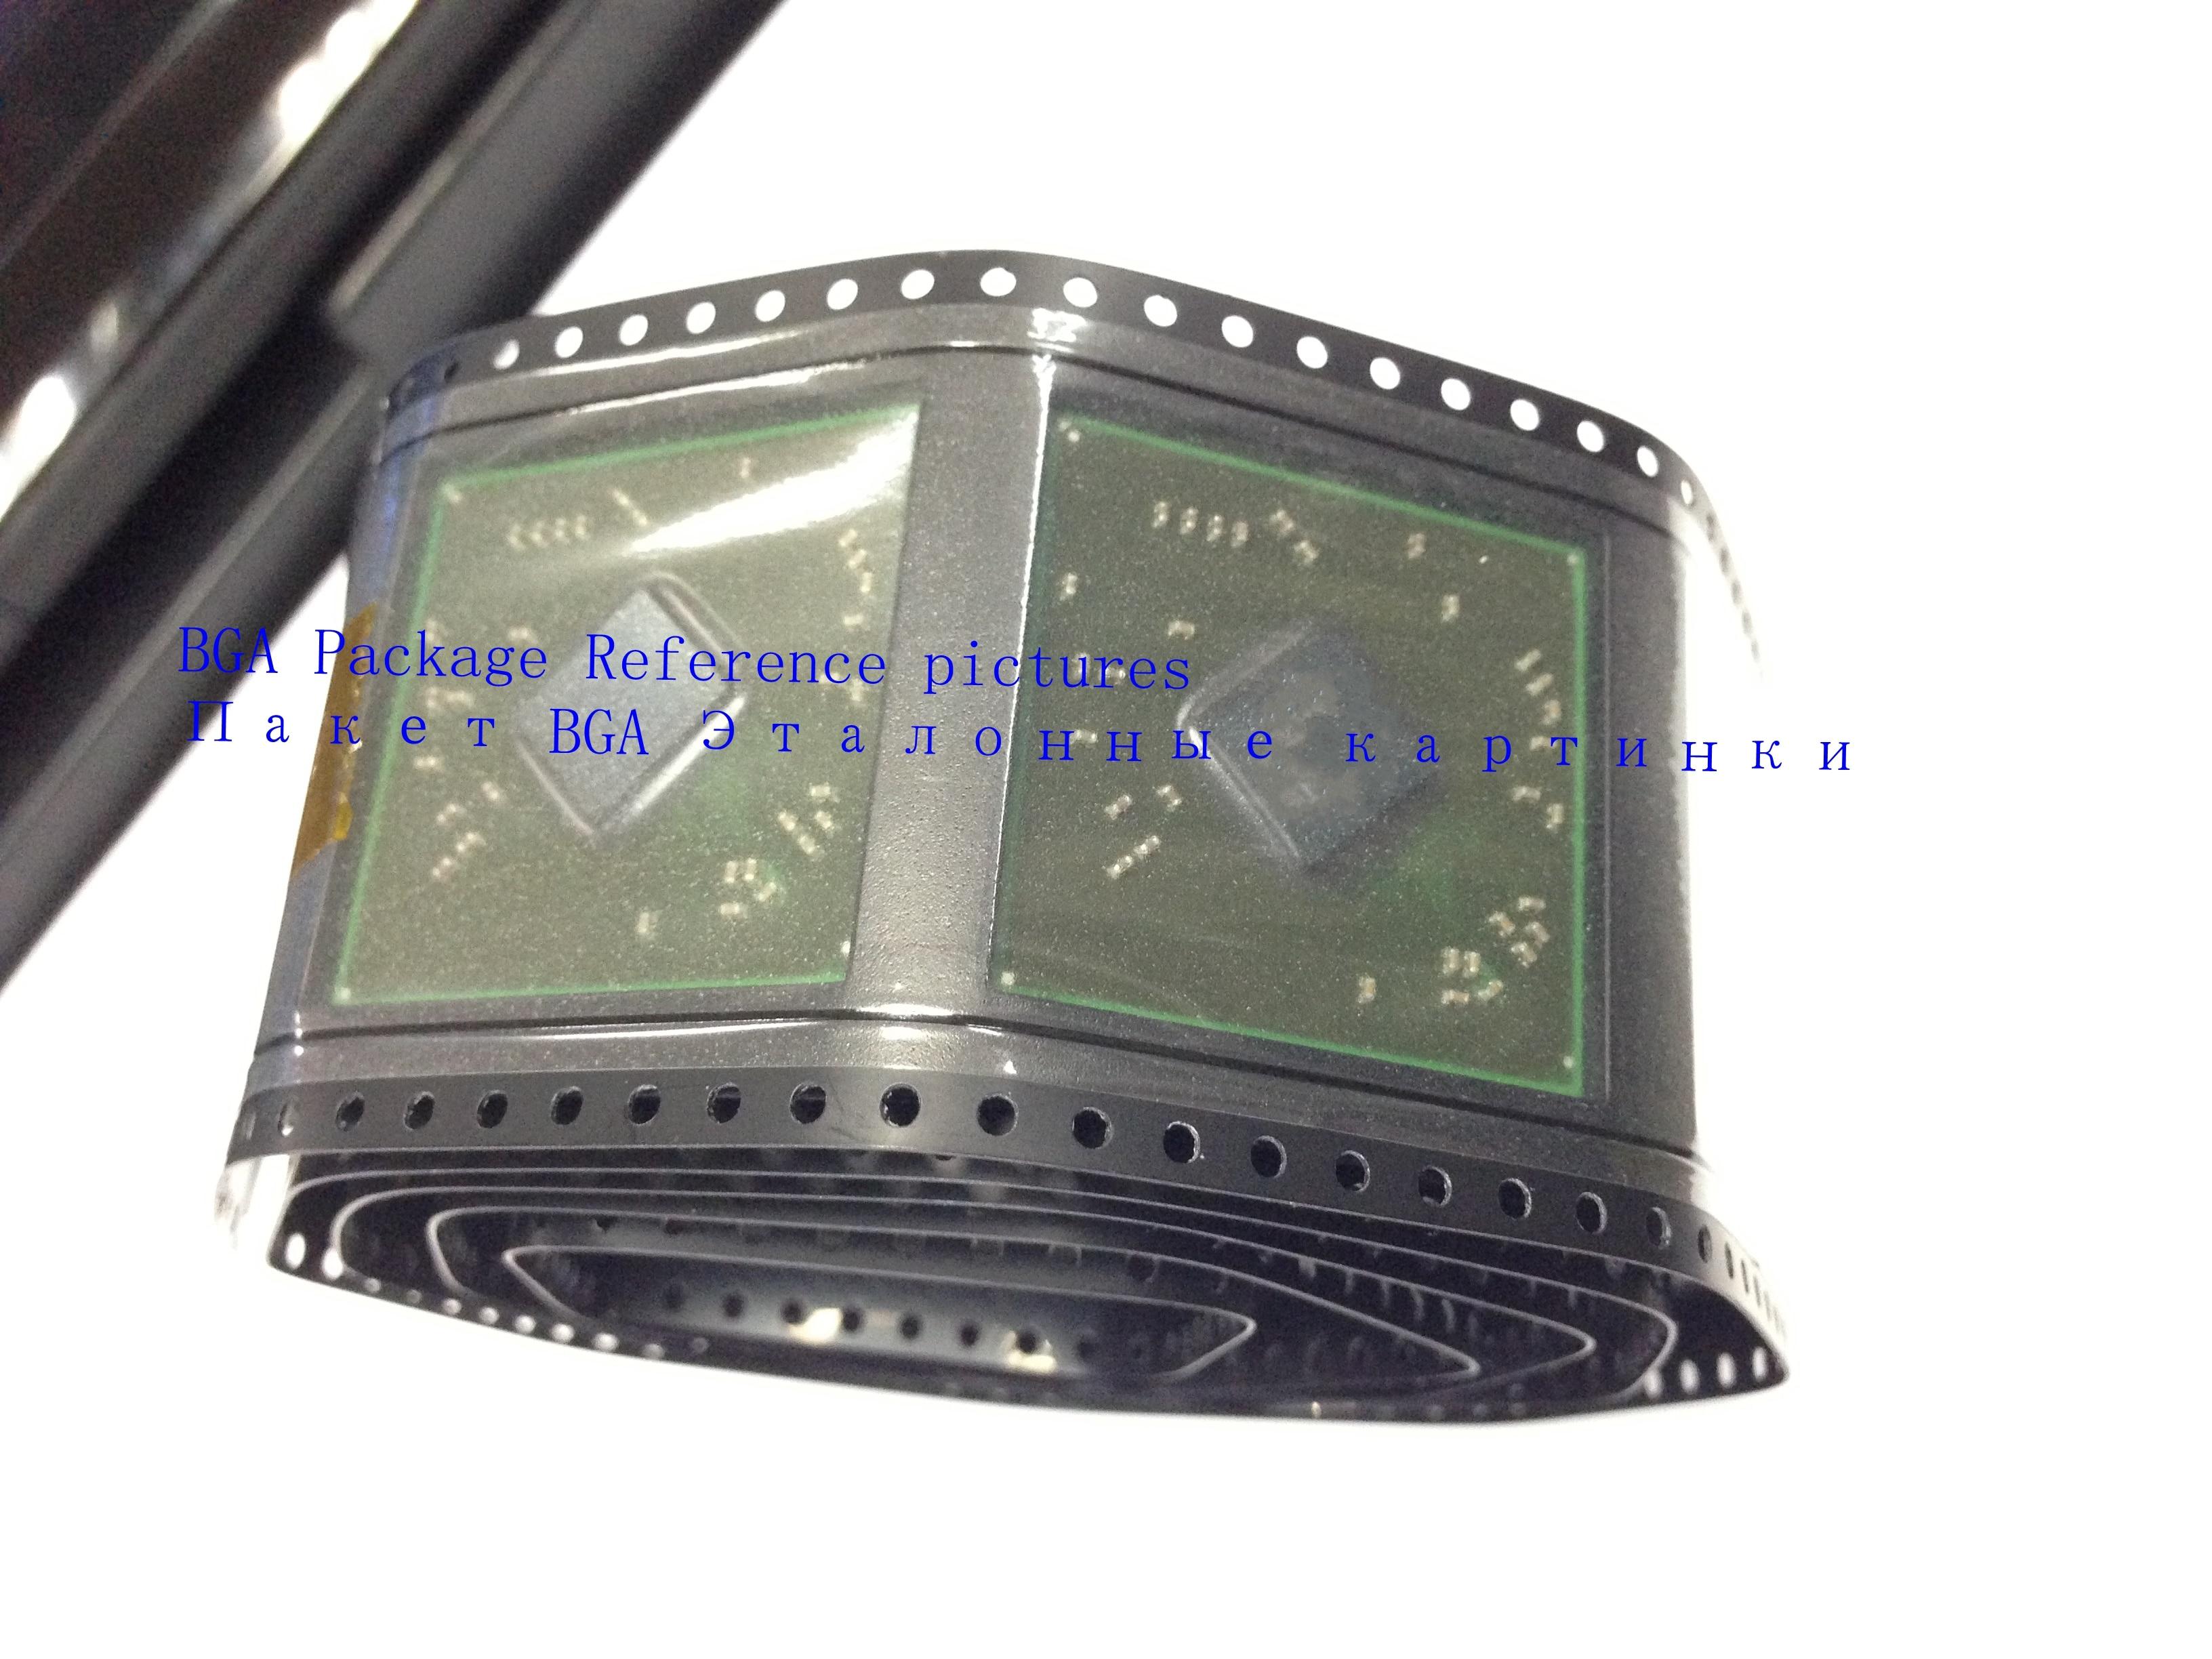 1pcs/lot 100% New G98-605-U2 G98 605 U2 BGA Chipset1pcs/lot 100% New G98-605-U2 G98 605 U2 BGA Chipset